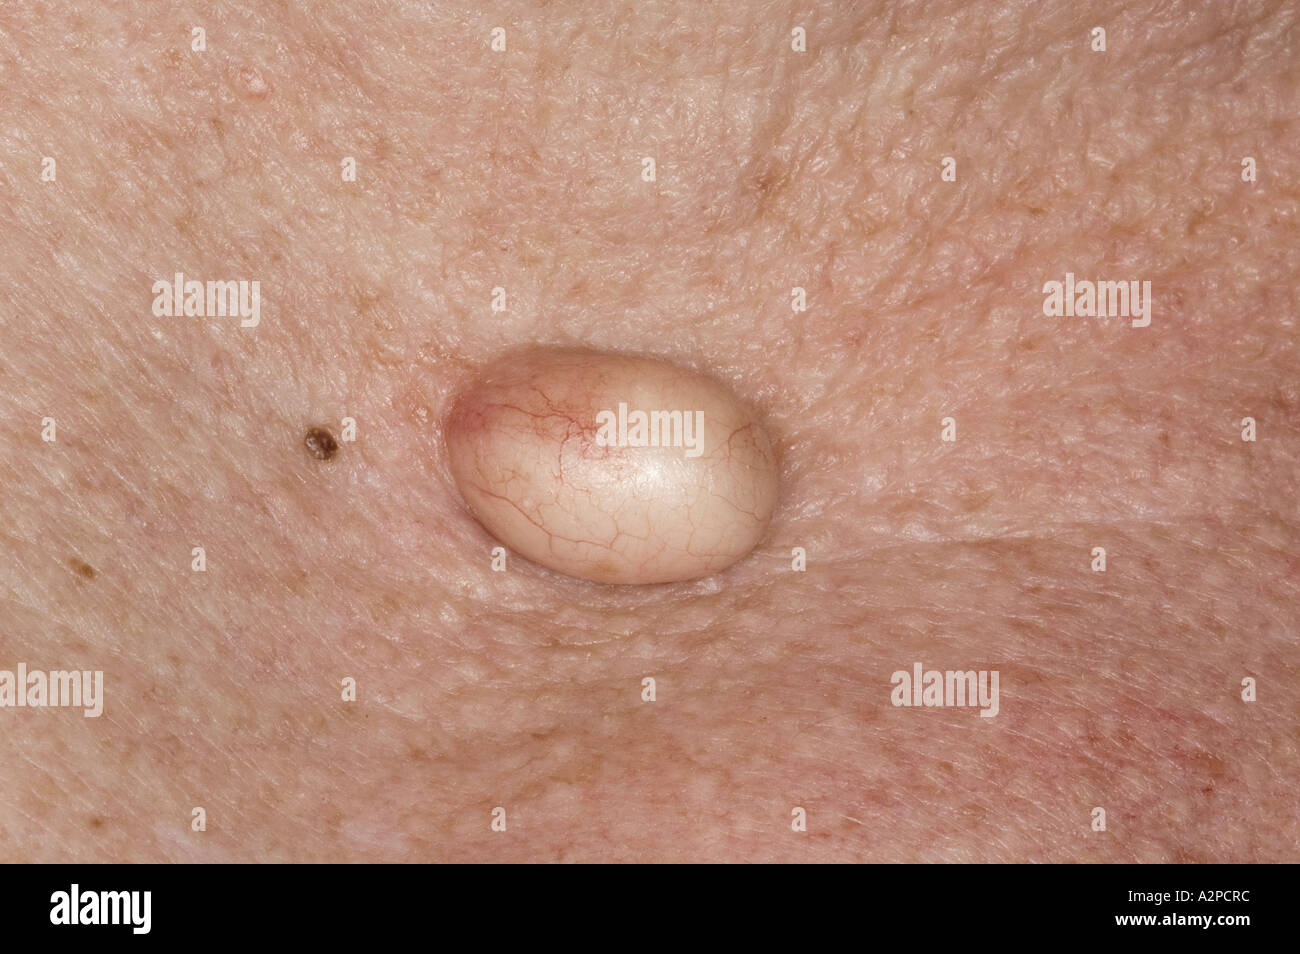 sebaceous cyst stock photo, royalty free image: 6041467 - alamy, Skeleton